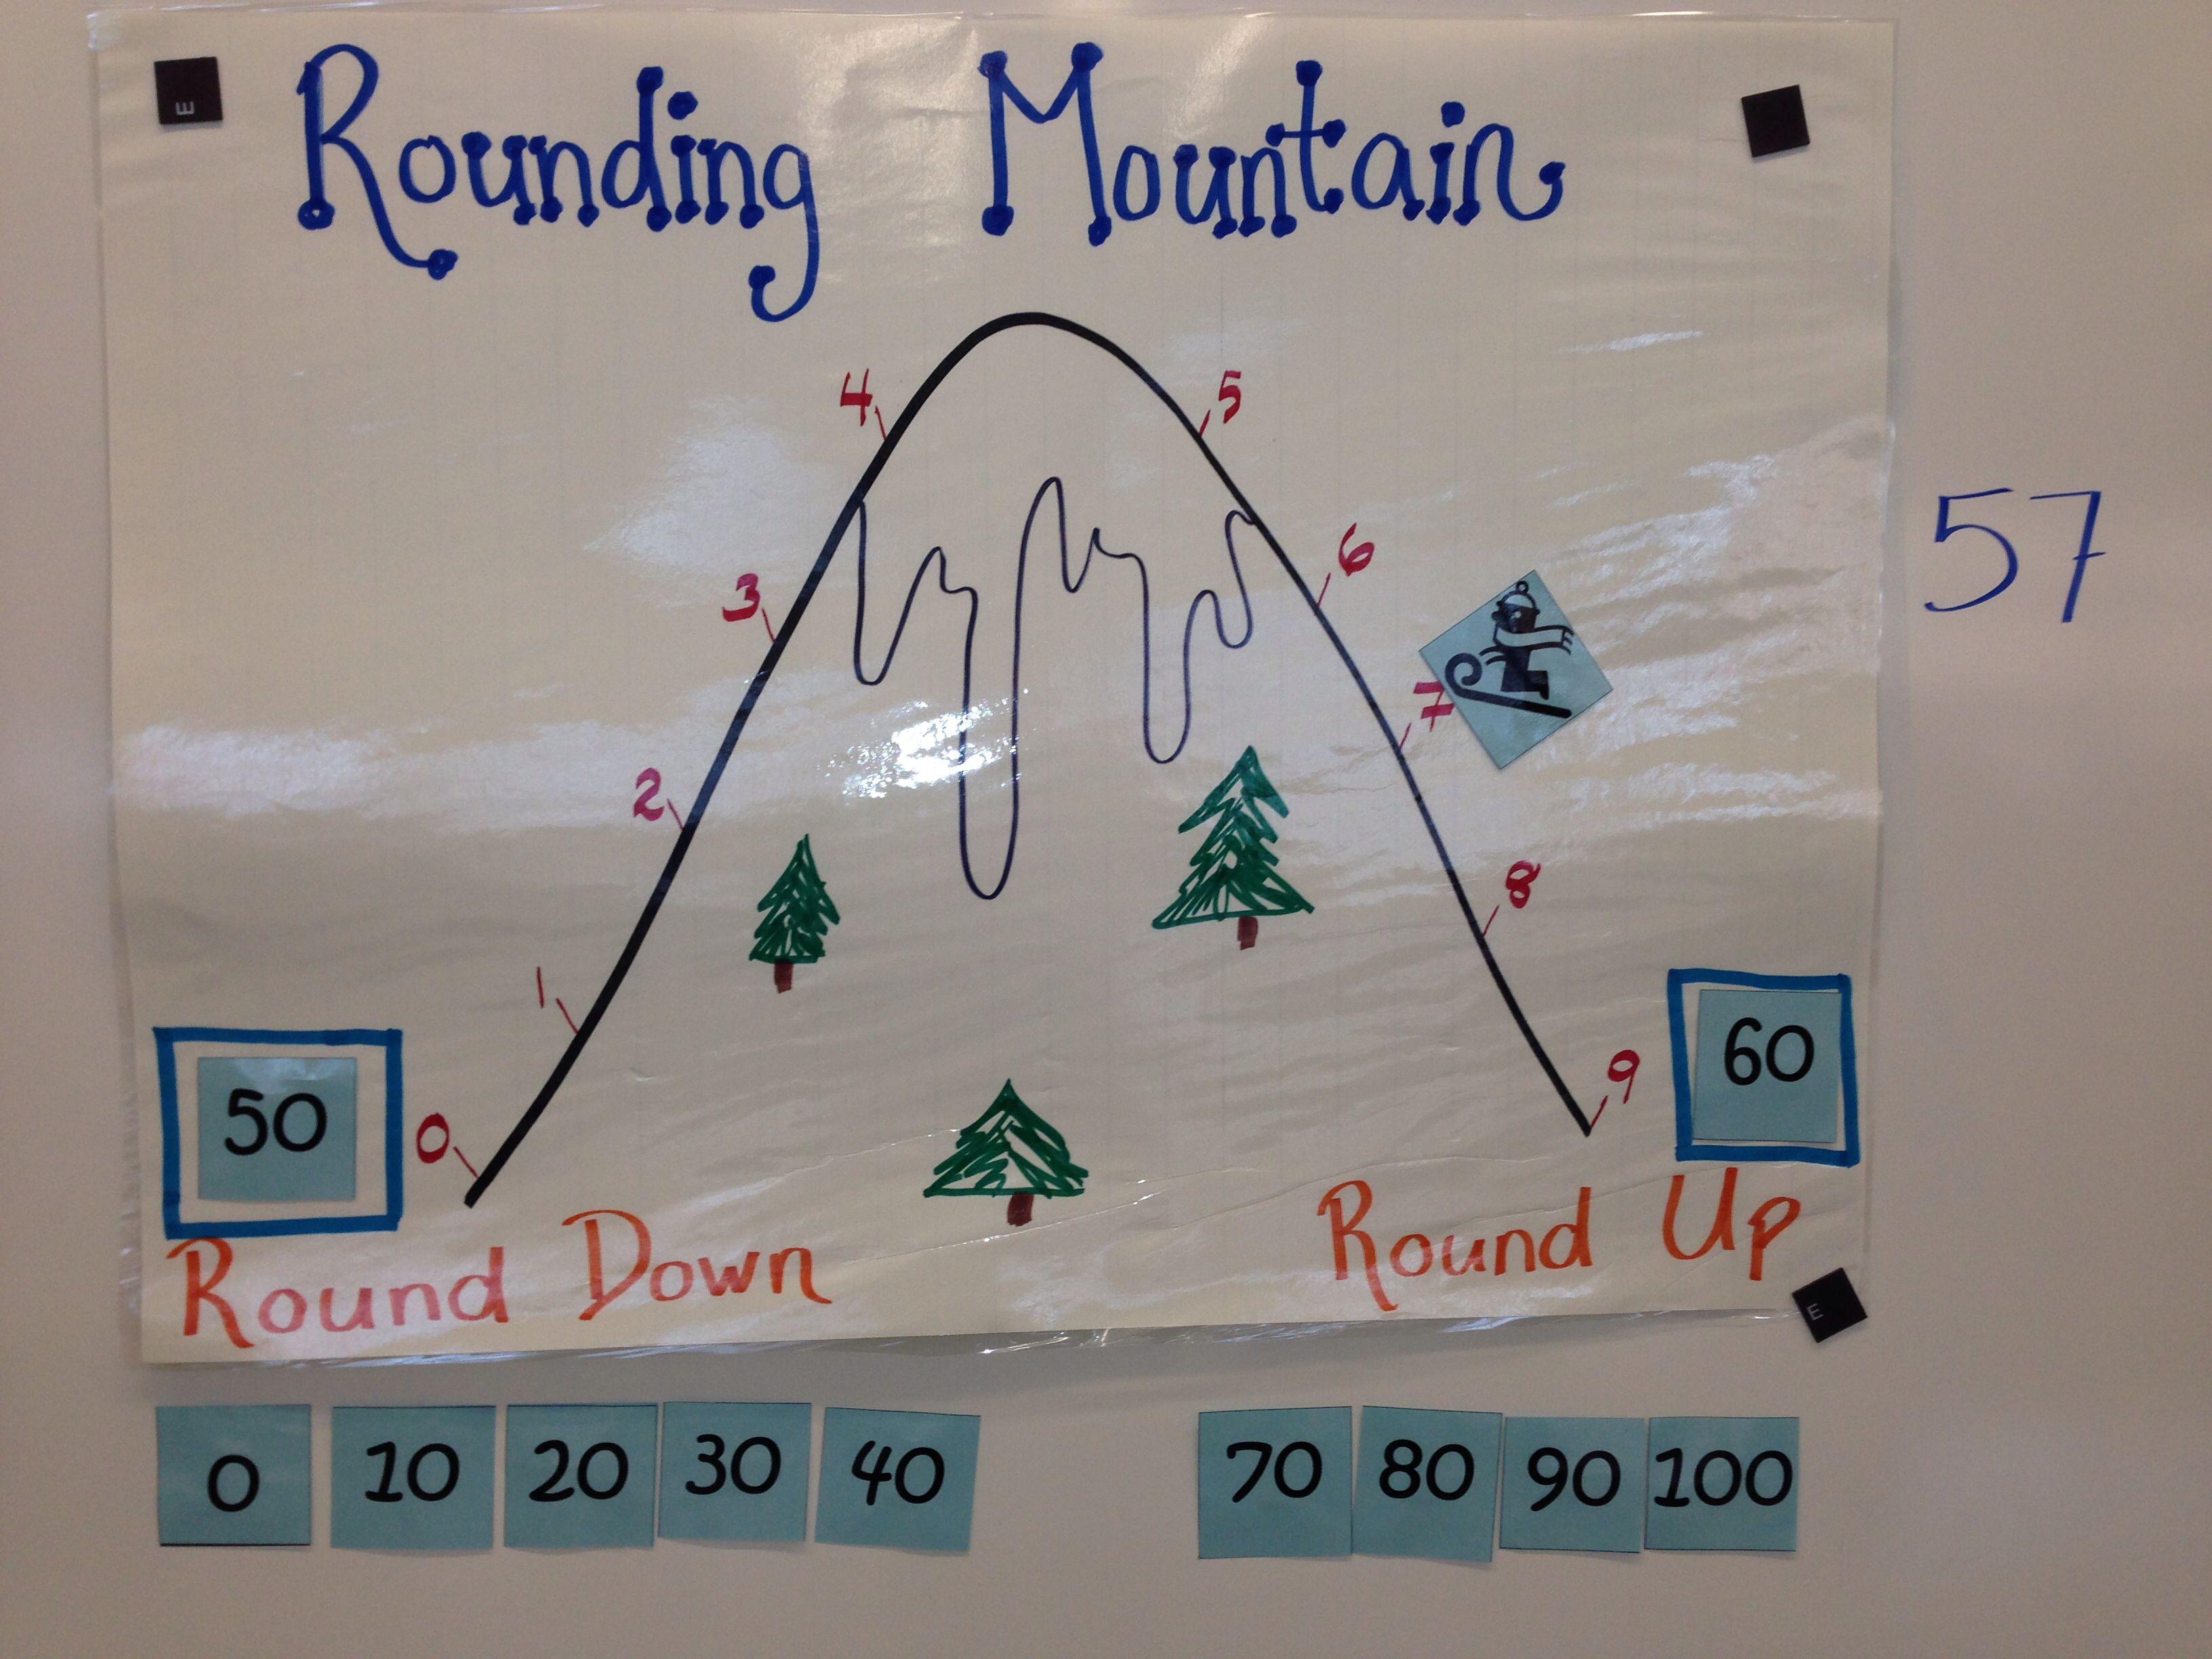 Rounding Mountain Teaching Kids To Round To The Nearest 10 Worked Wonderfully Money Math Math School Teaching Rounding [ 2448 x 3264 Pixel ]